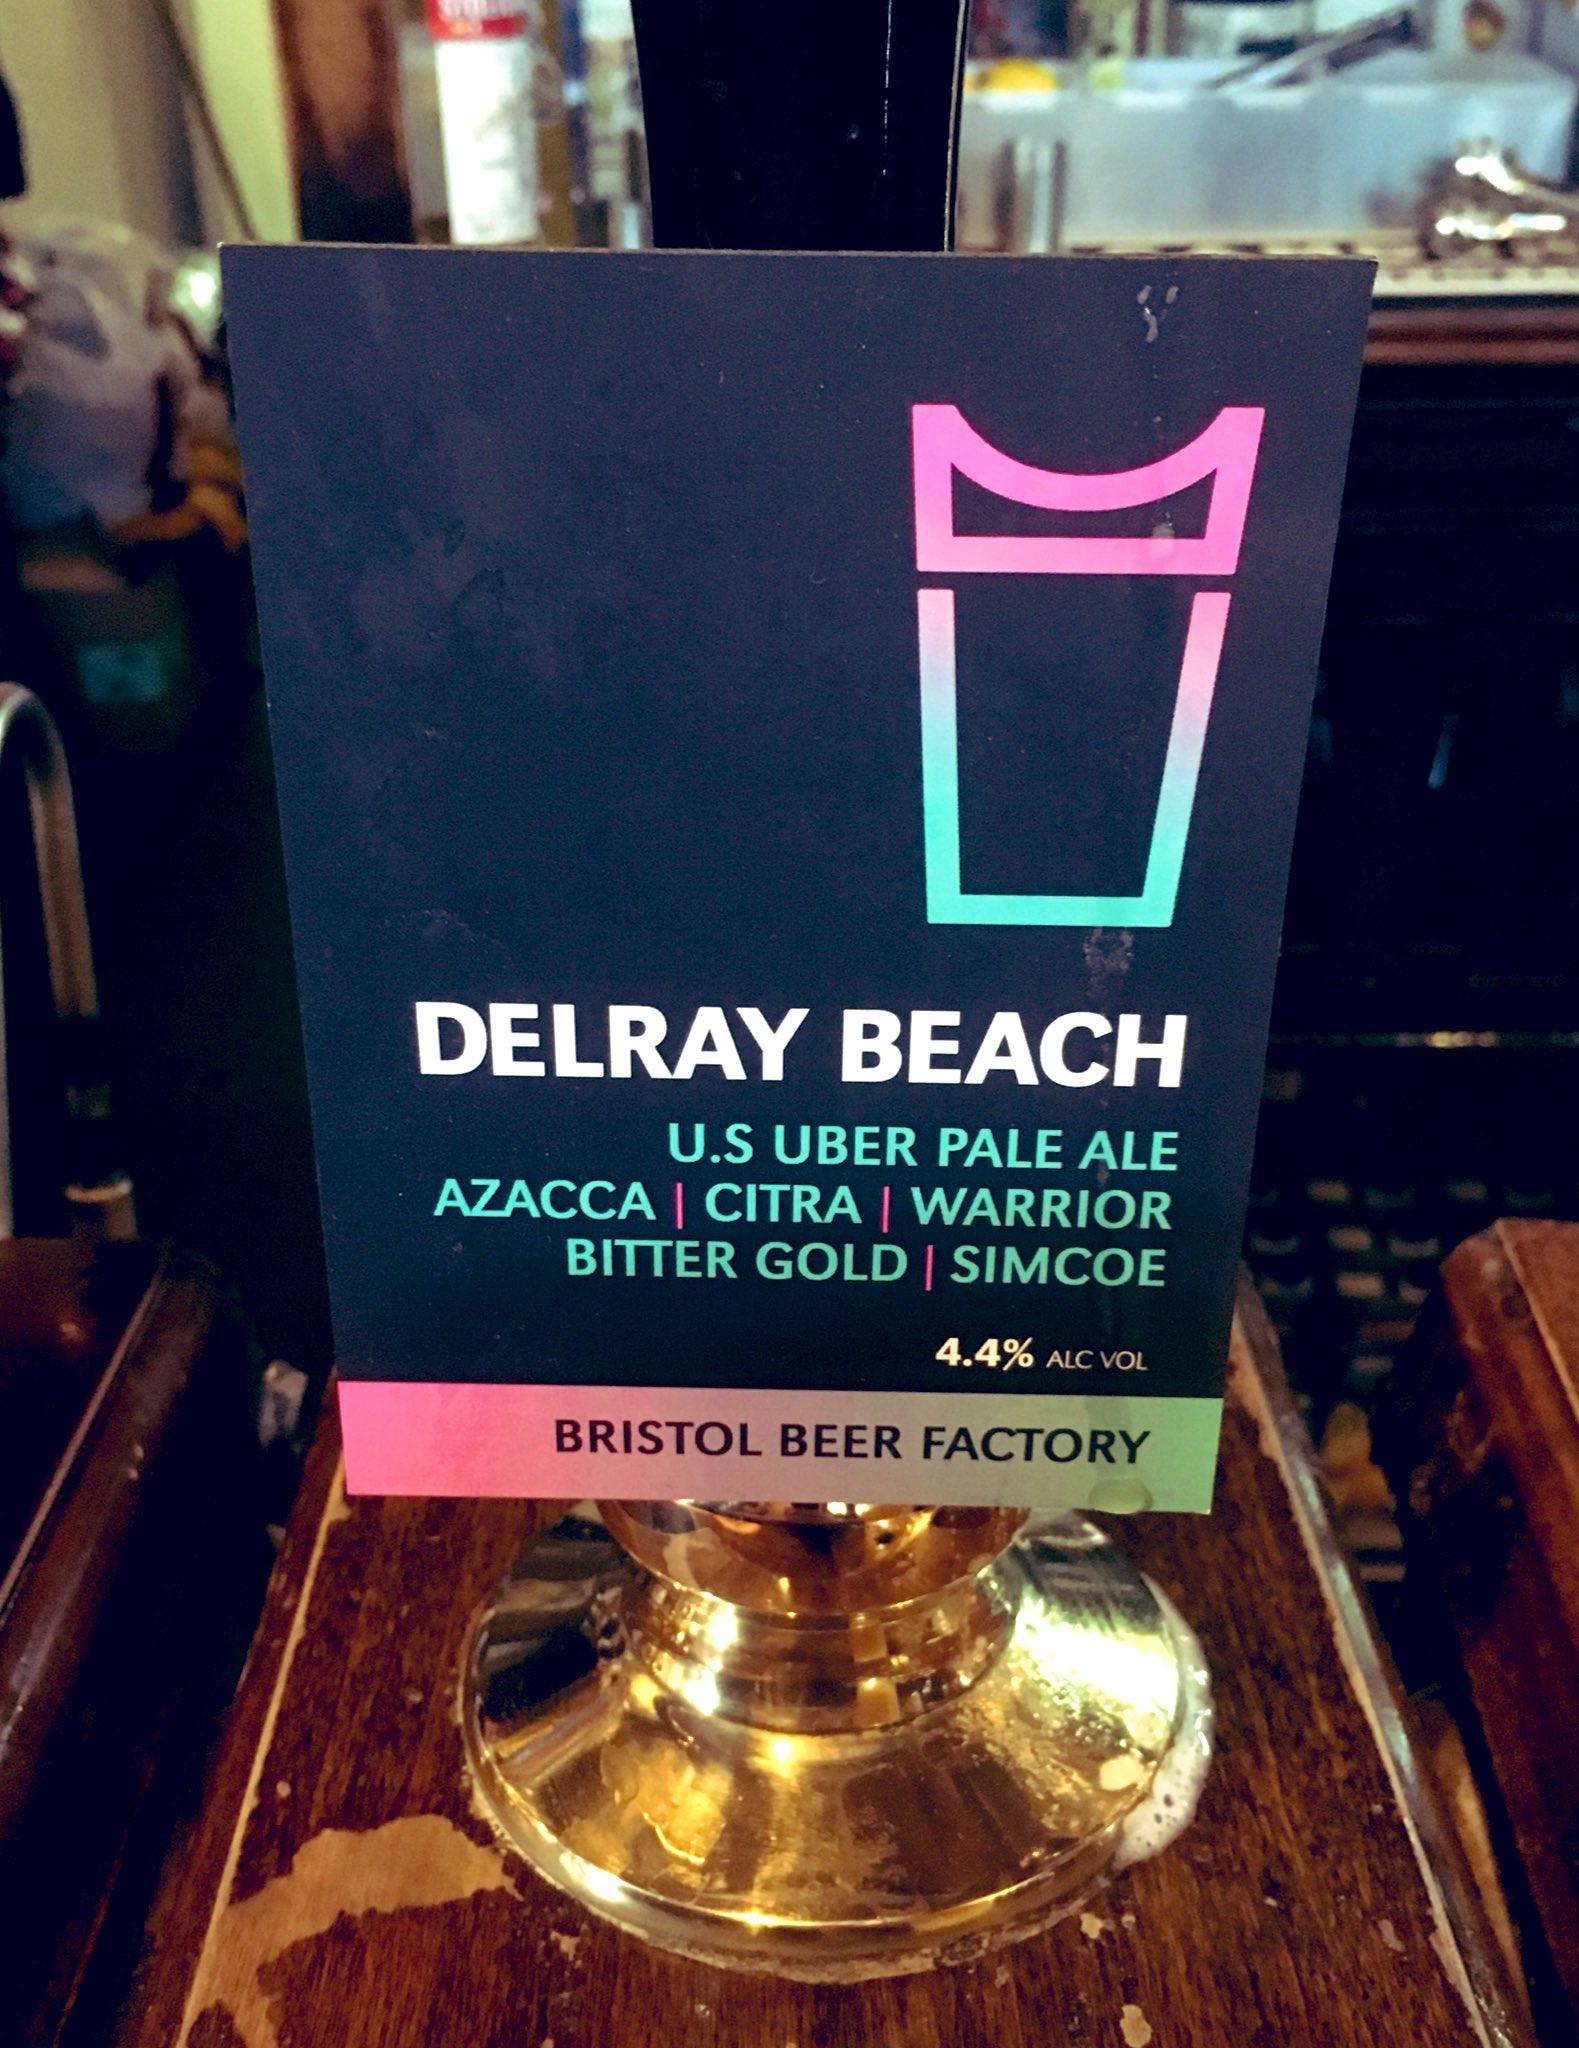 195: Delray Beech